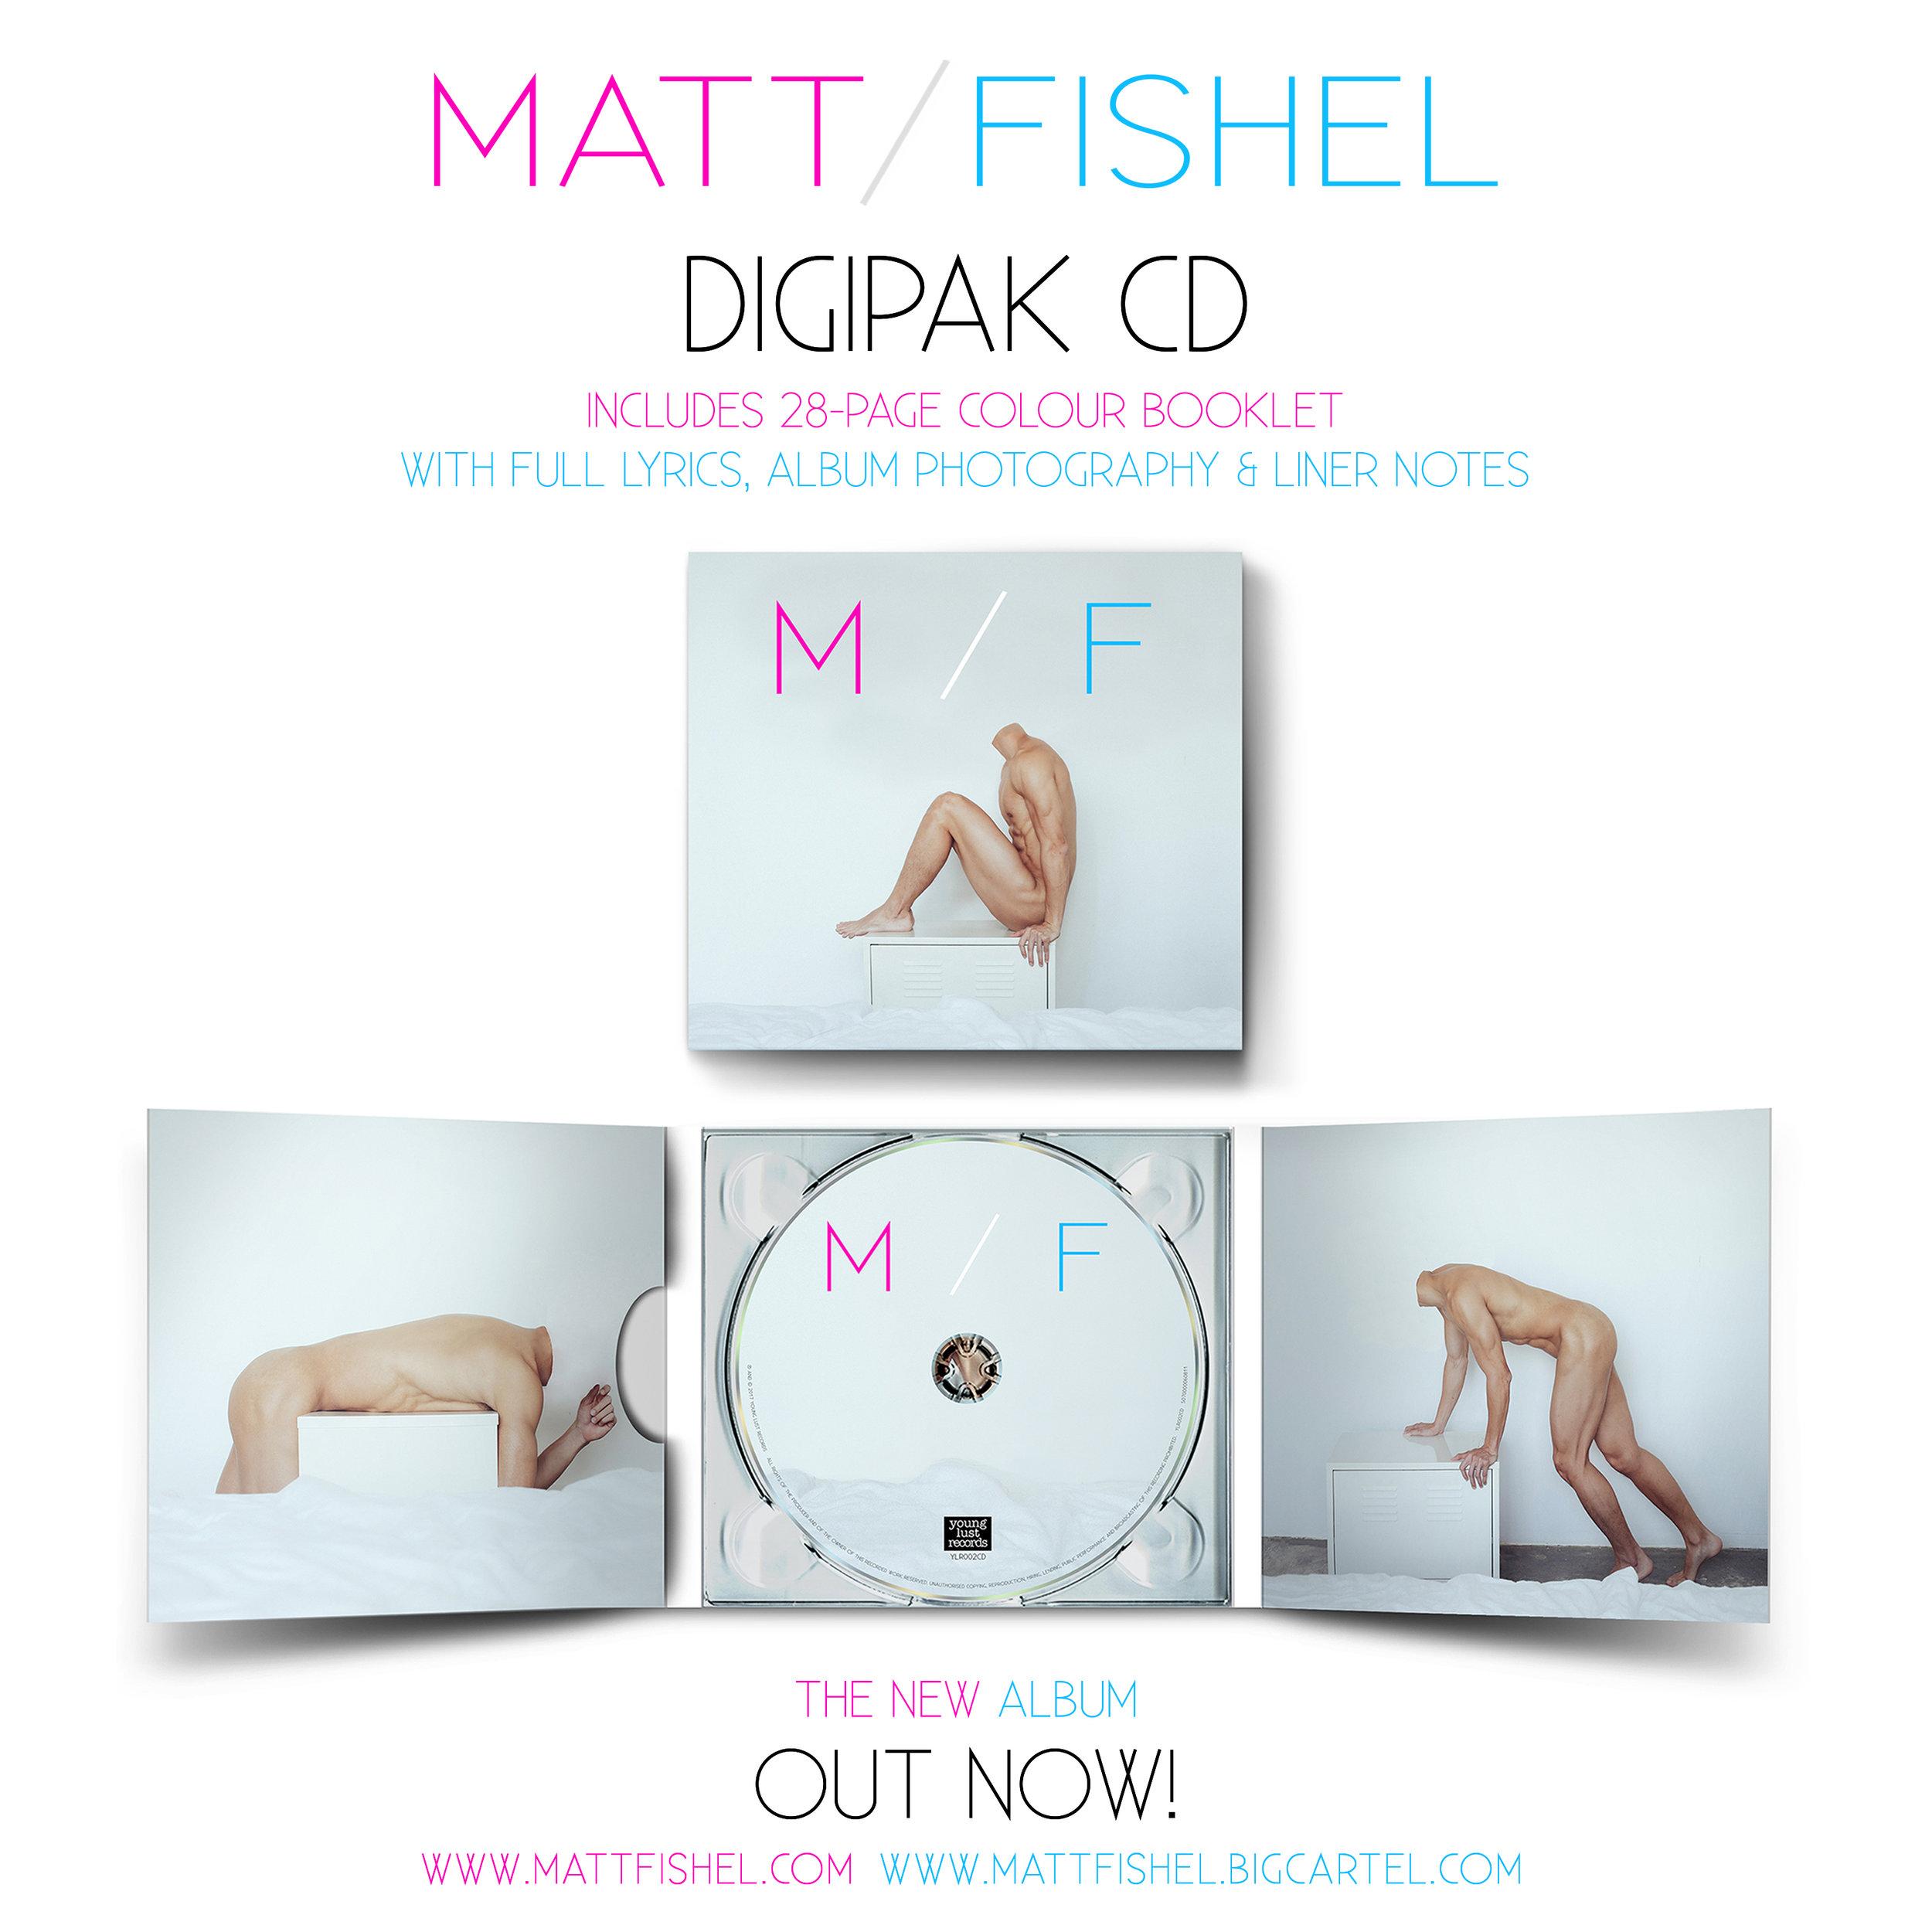 Matt Fishel_MF_OUT NOW_CD_1.jpg